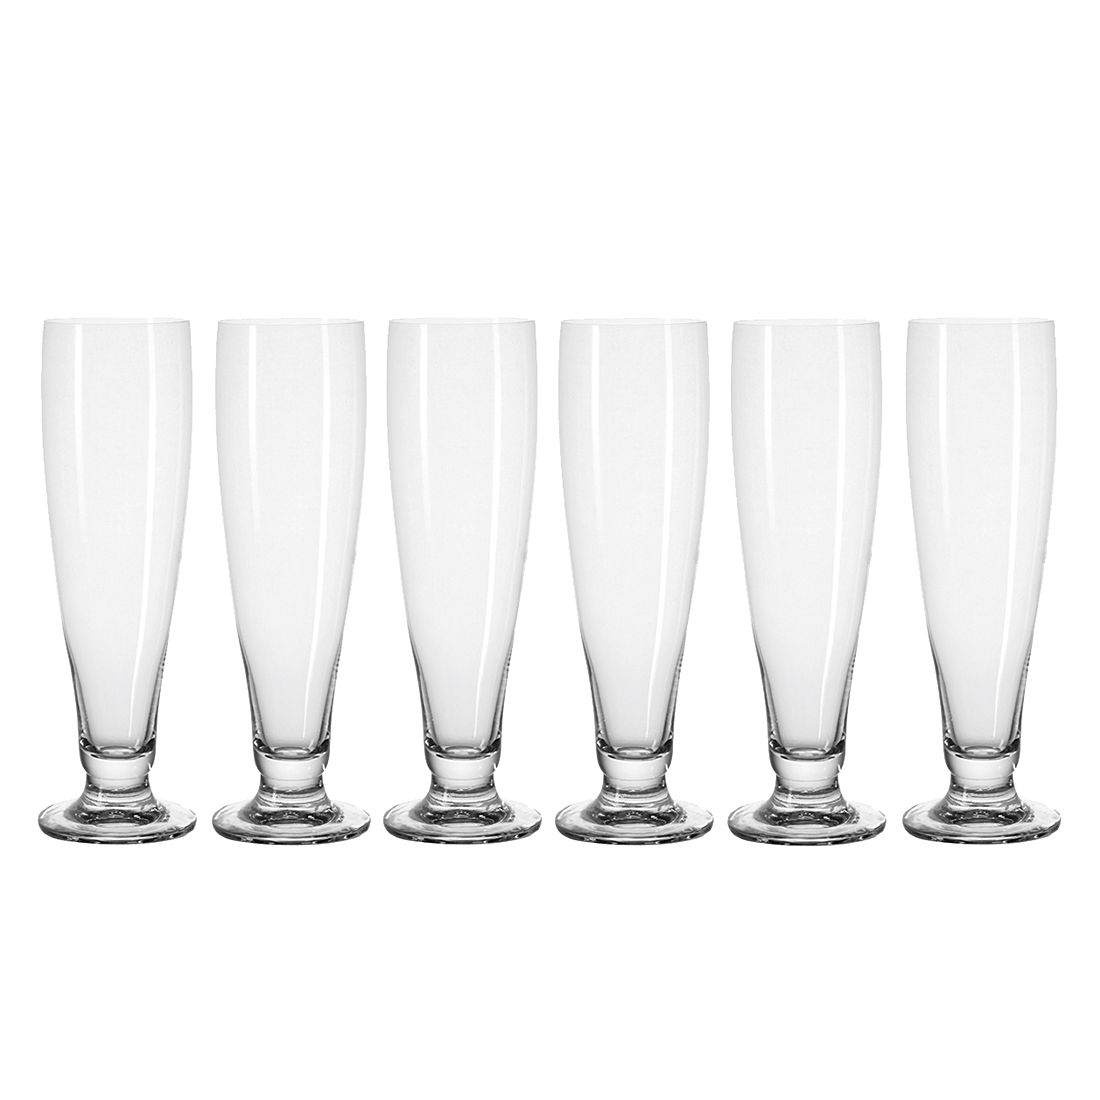 Pilsglas Bionda (6er-Set) – 500 ml, Leonardo bestellen